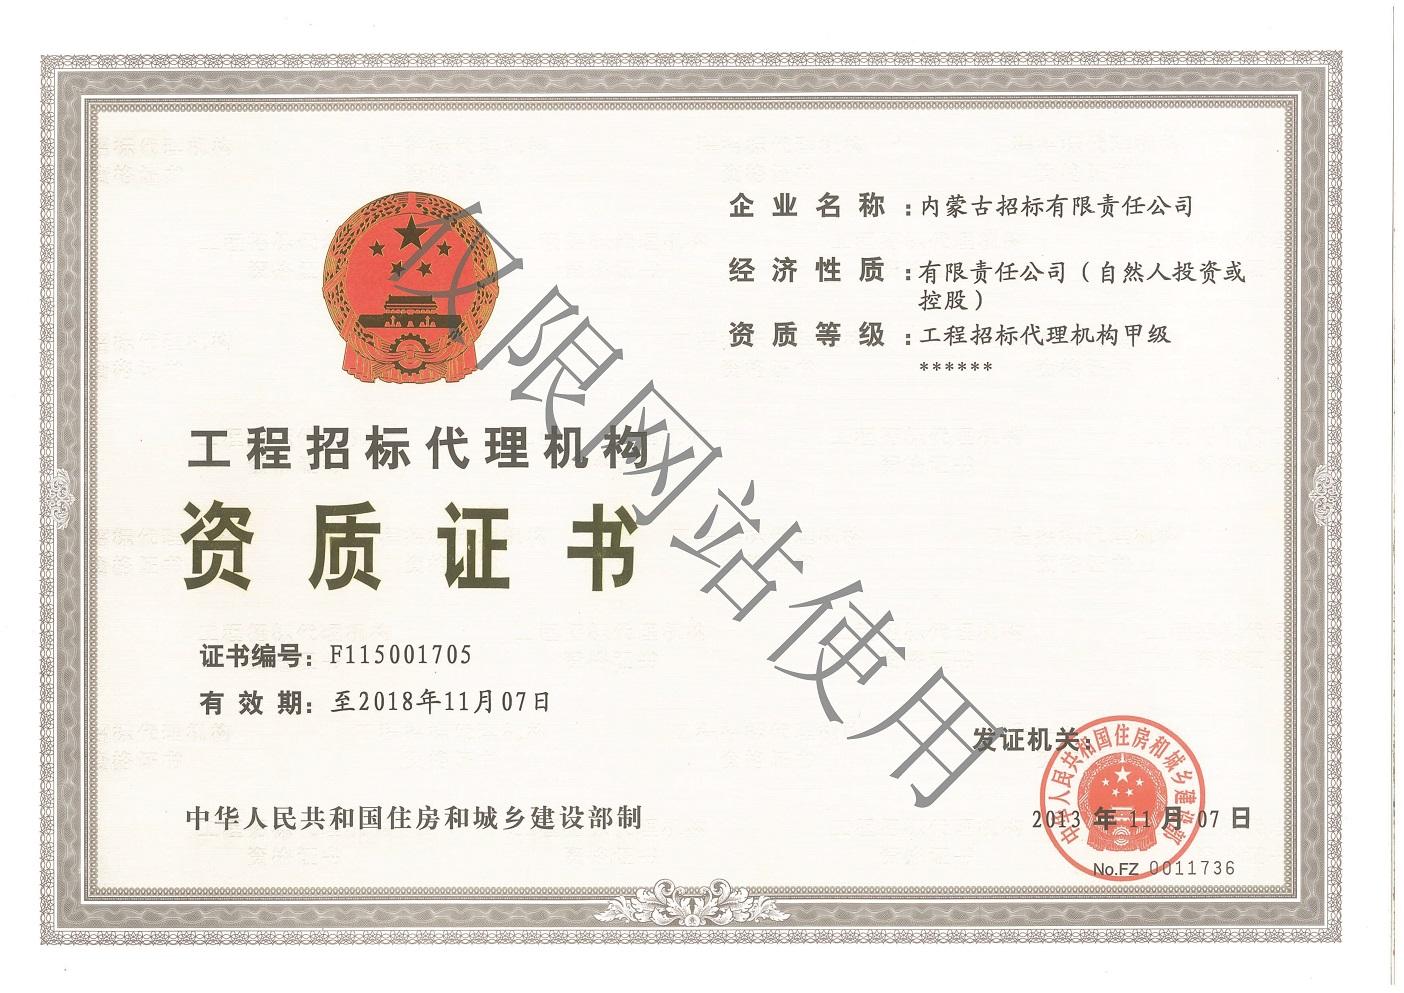 gong程88娱乐2官wang代li紌hun墩拘?></a></li>             <li><a href=